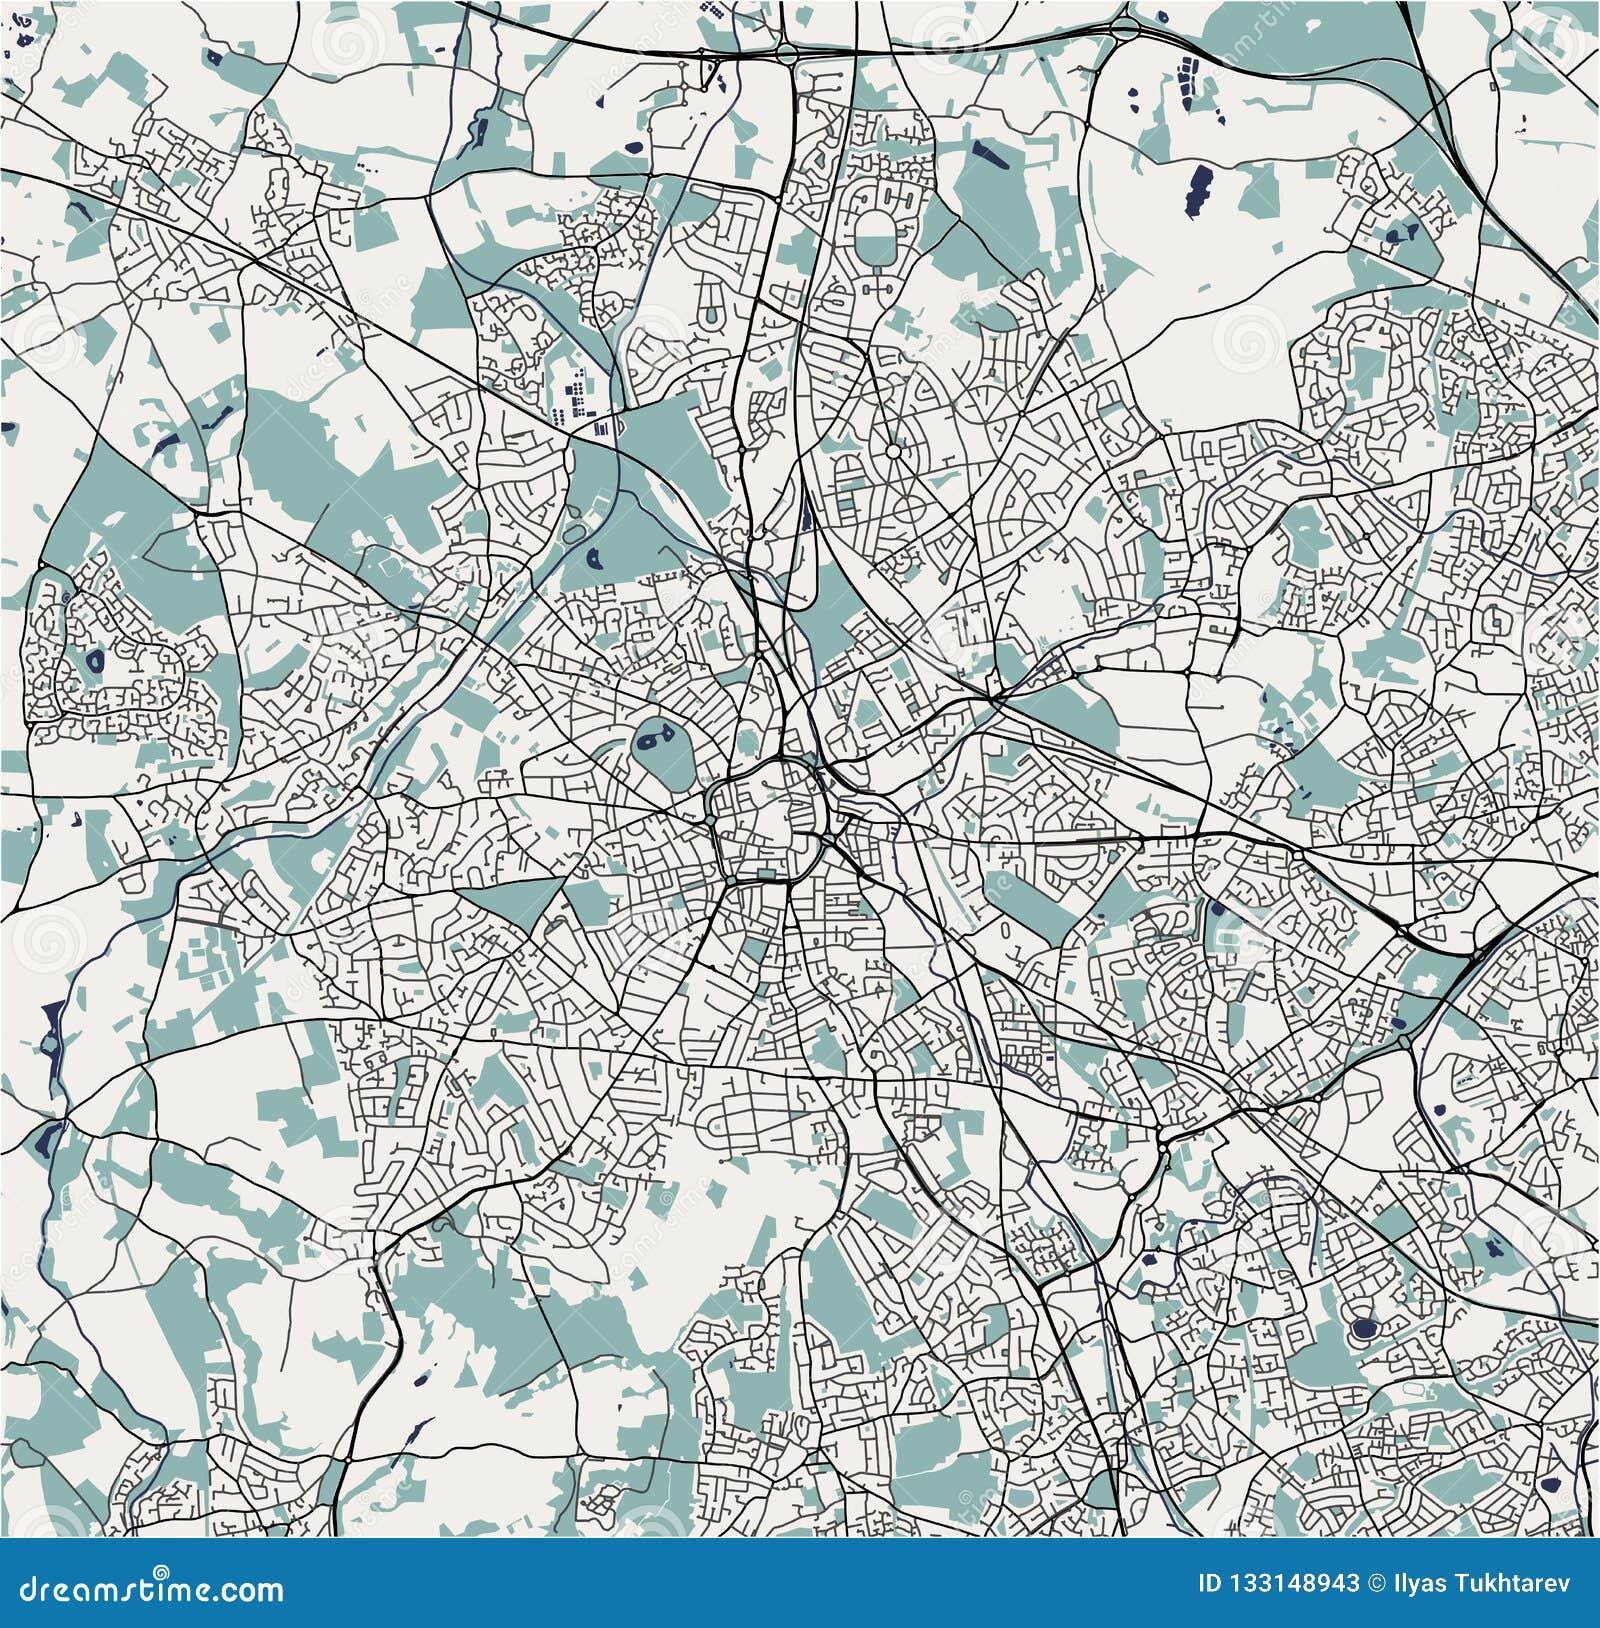 Map Of England Midlands.Map Of The City Of Birmingham Wolverhampton English Midlands